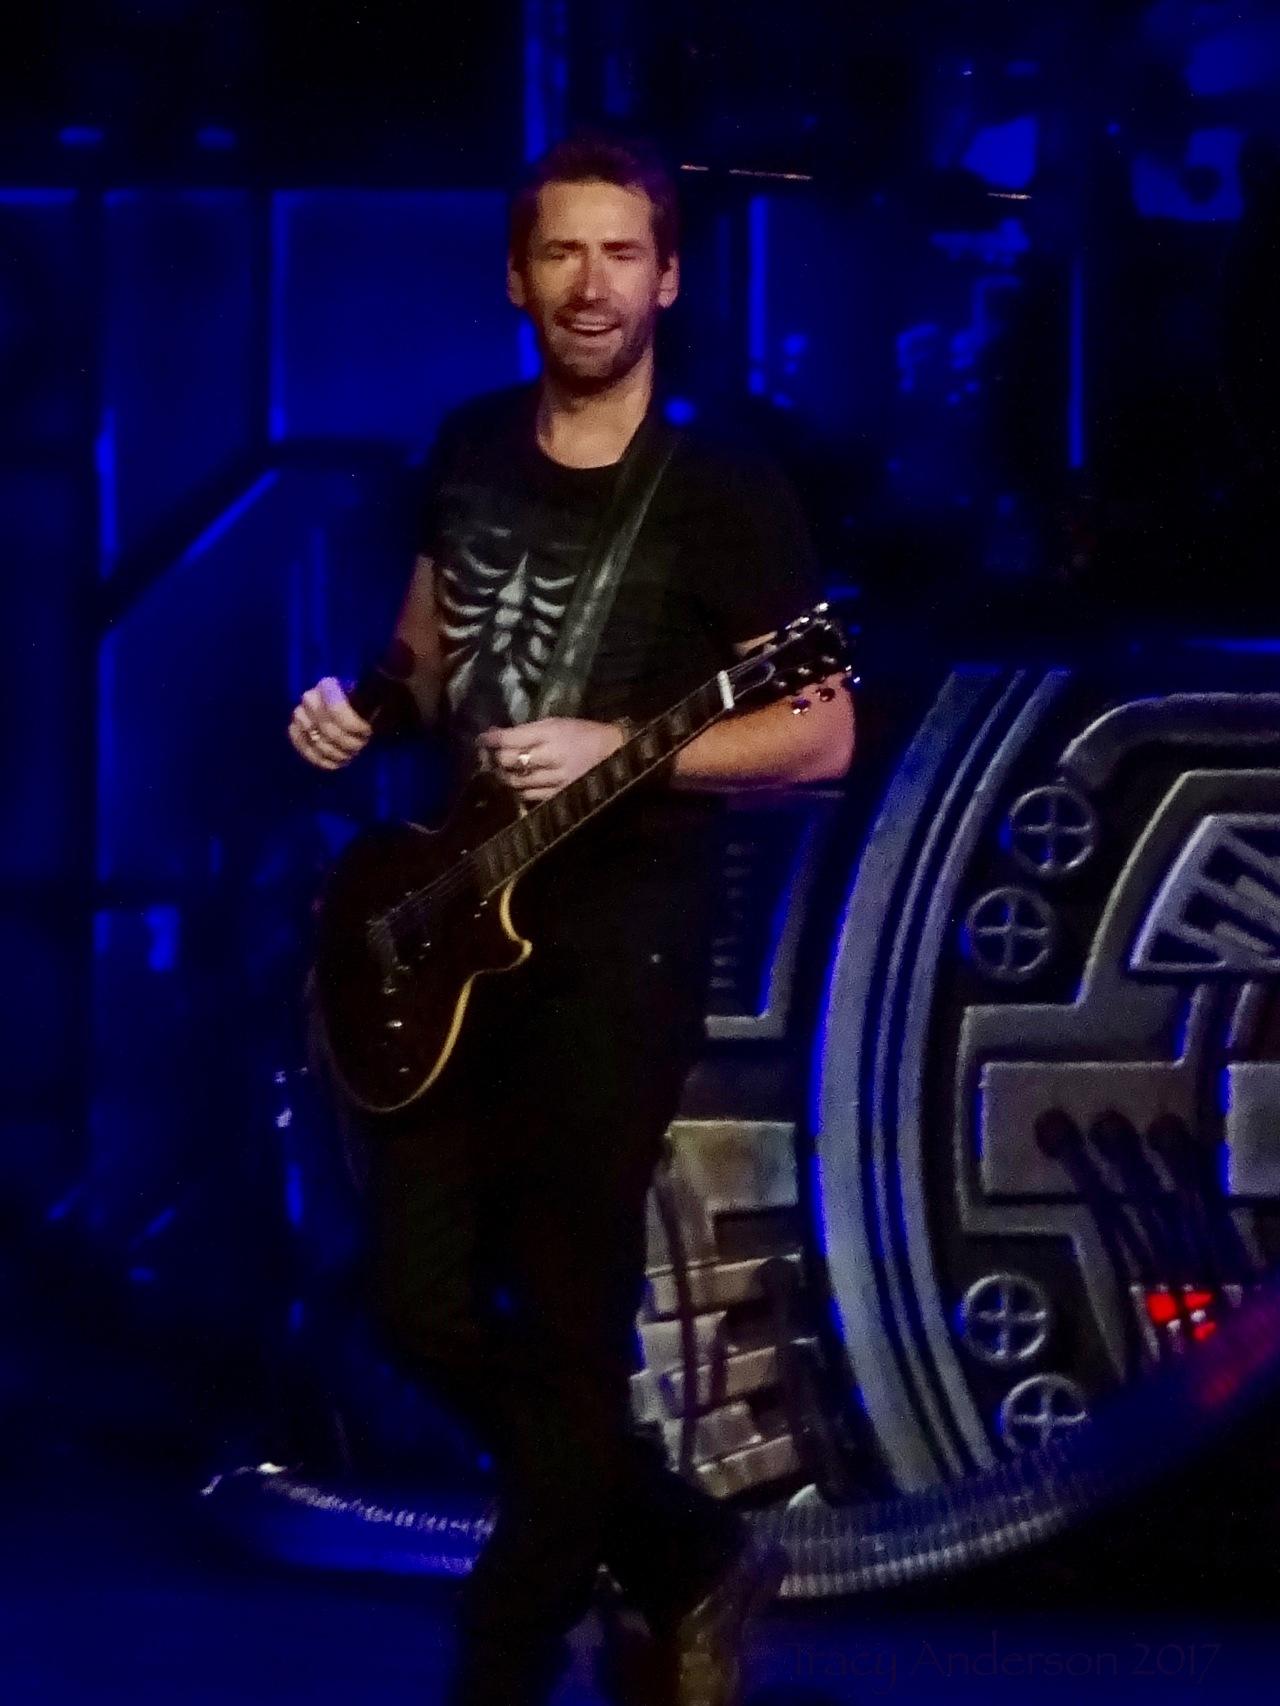 Chad Kroeger of Nickelback Rogers Place Edmonton Sept 28 2017